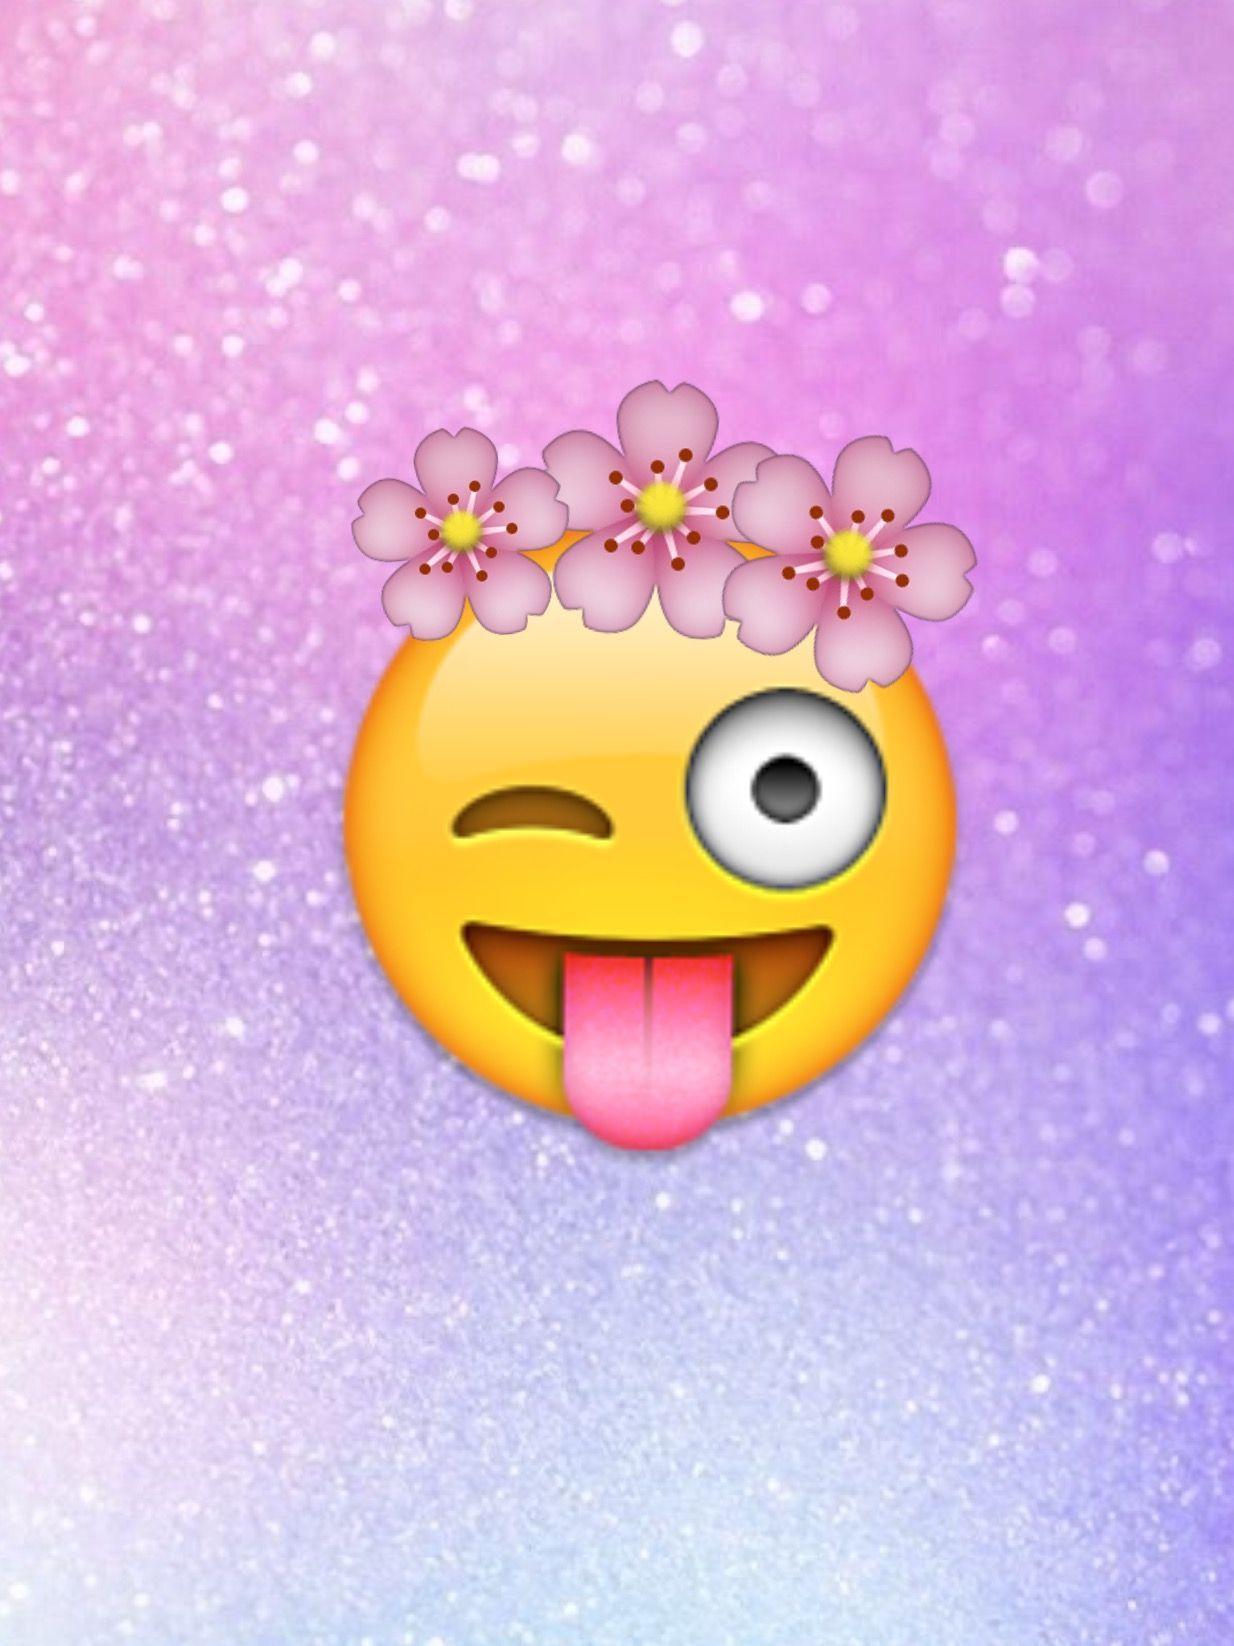 Girly Emoji Wallpapers Top Free Girly Emoji Backgrounds Wallpaperaccess